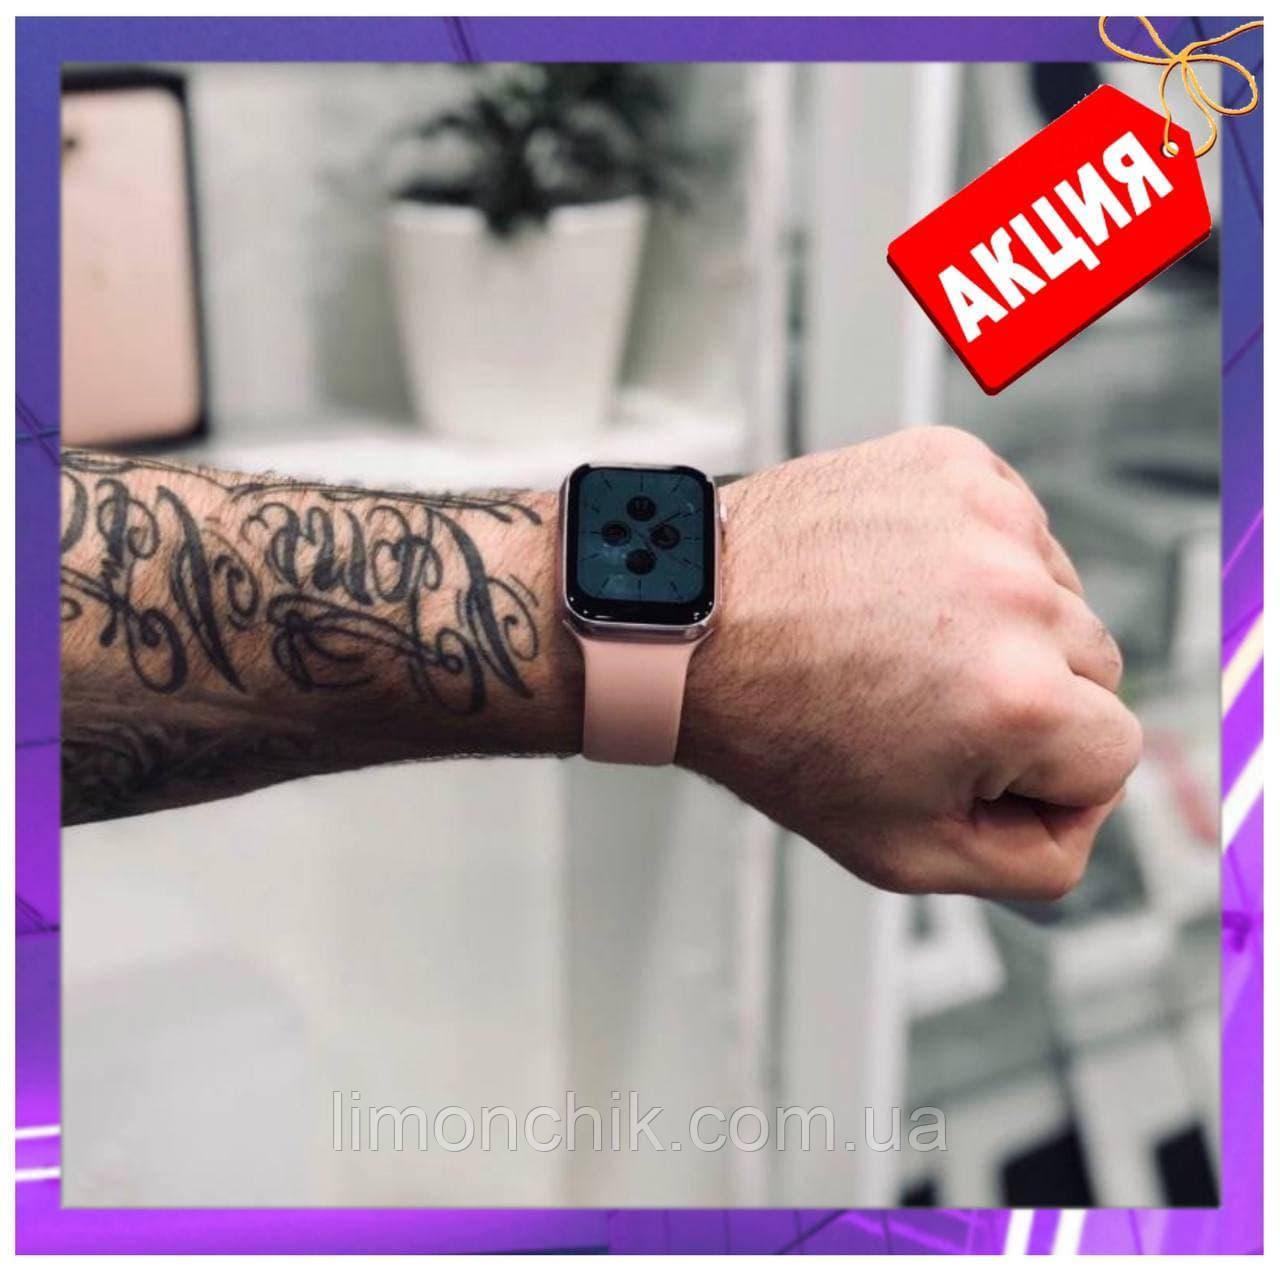 Дитячі смарт годинник з GPS Smart KIDS Watch